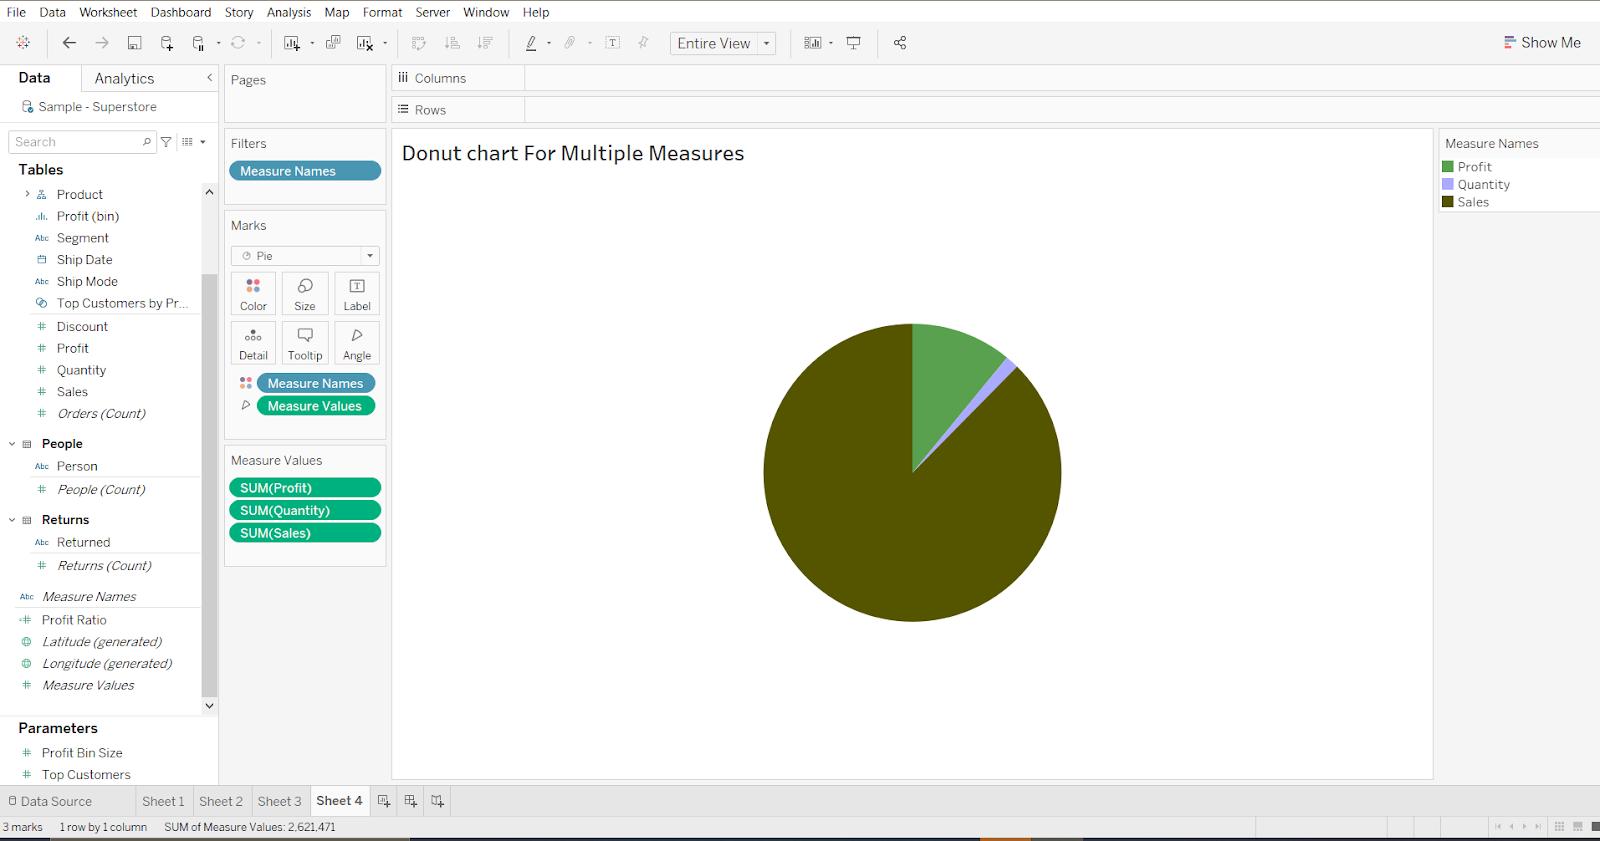 Donut chart for multiple measures